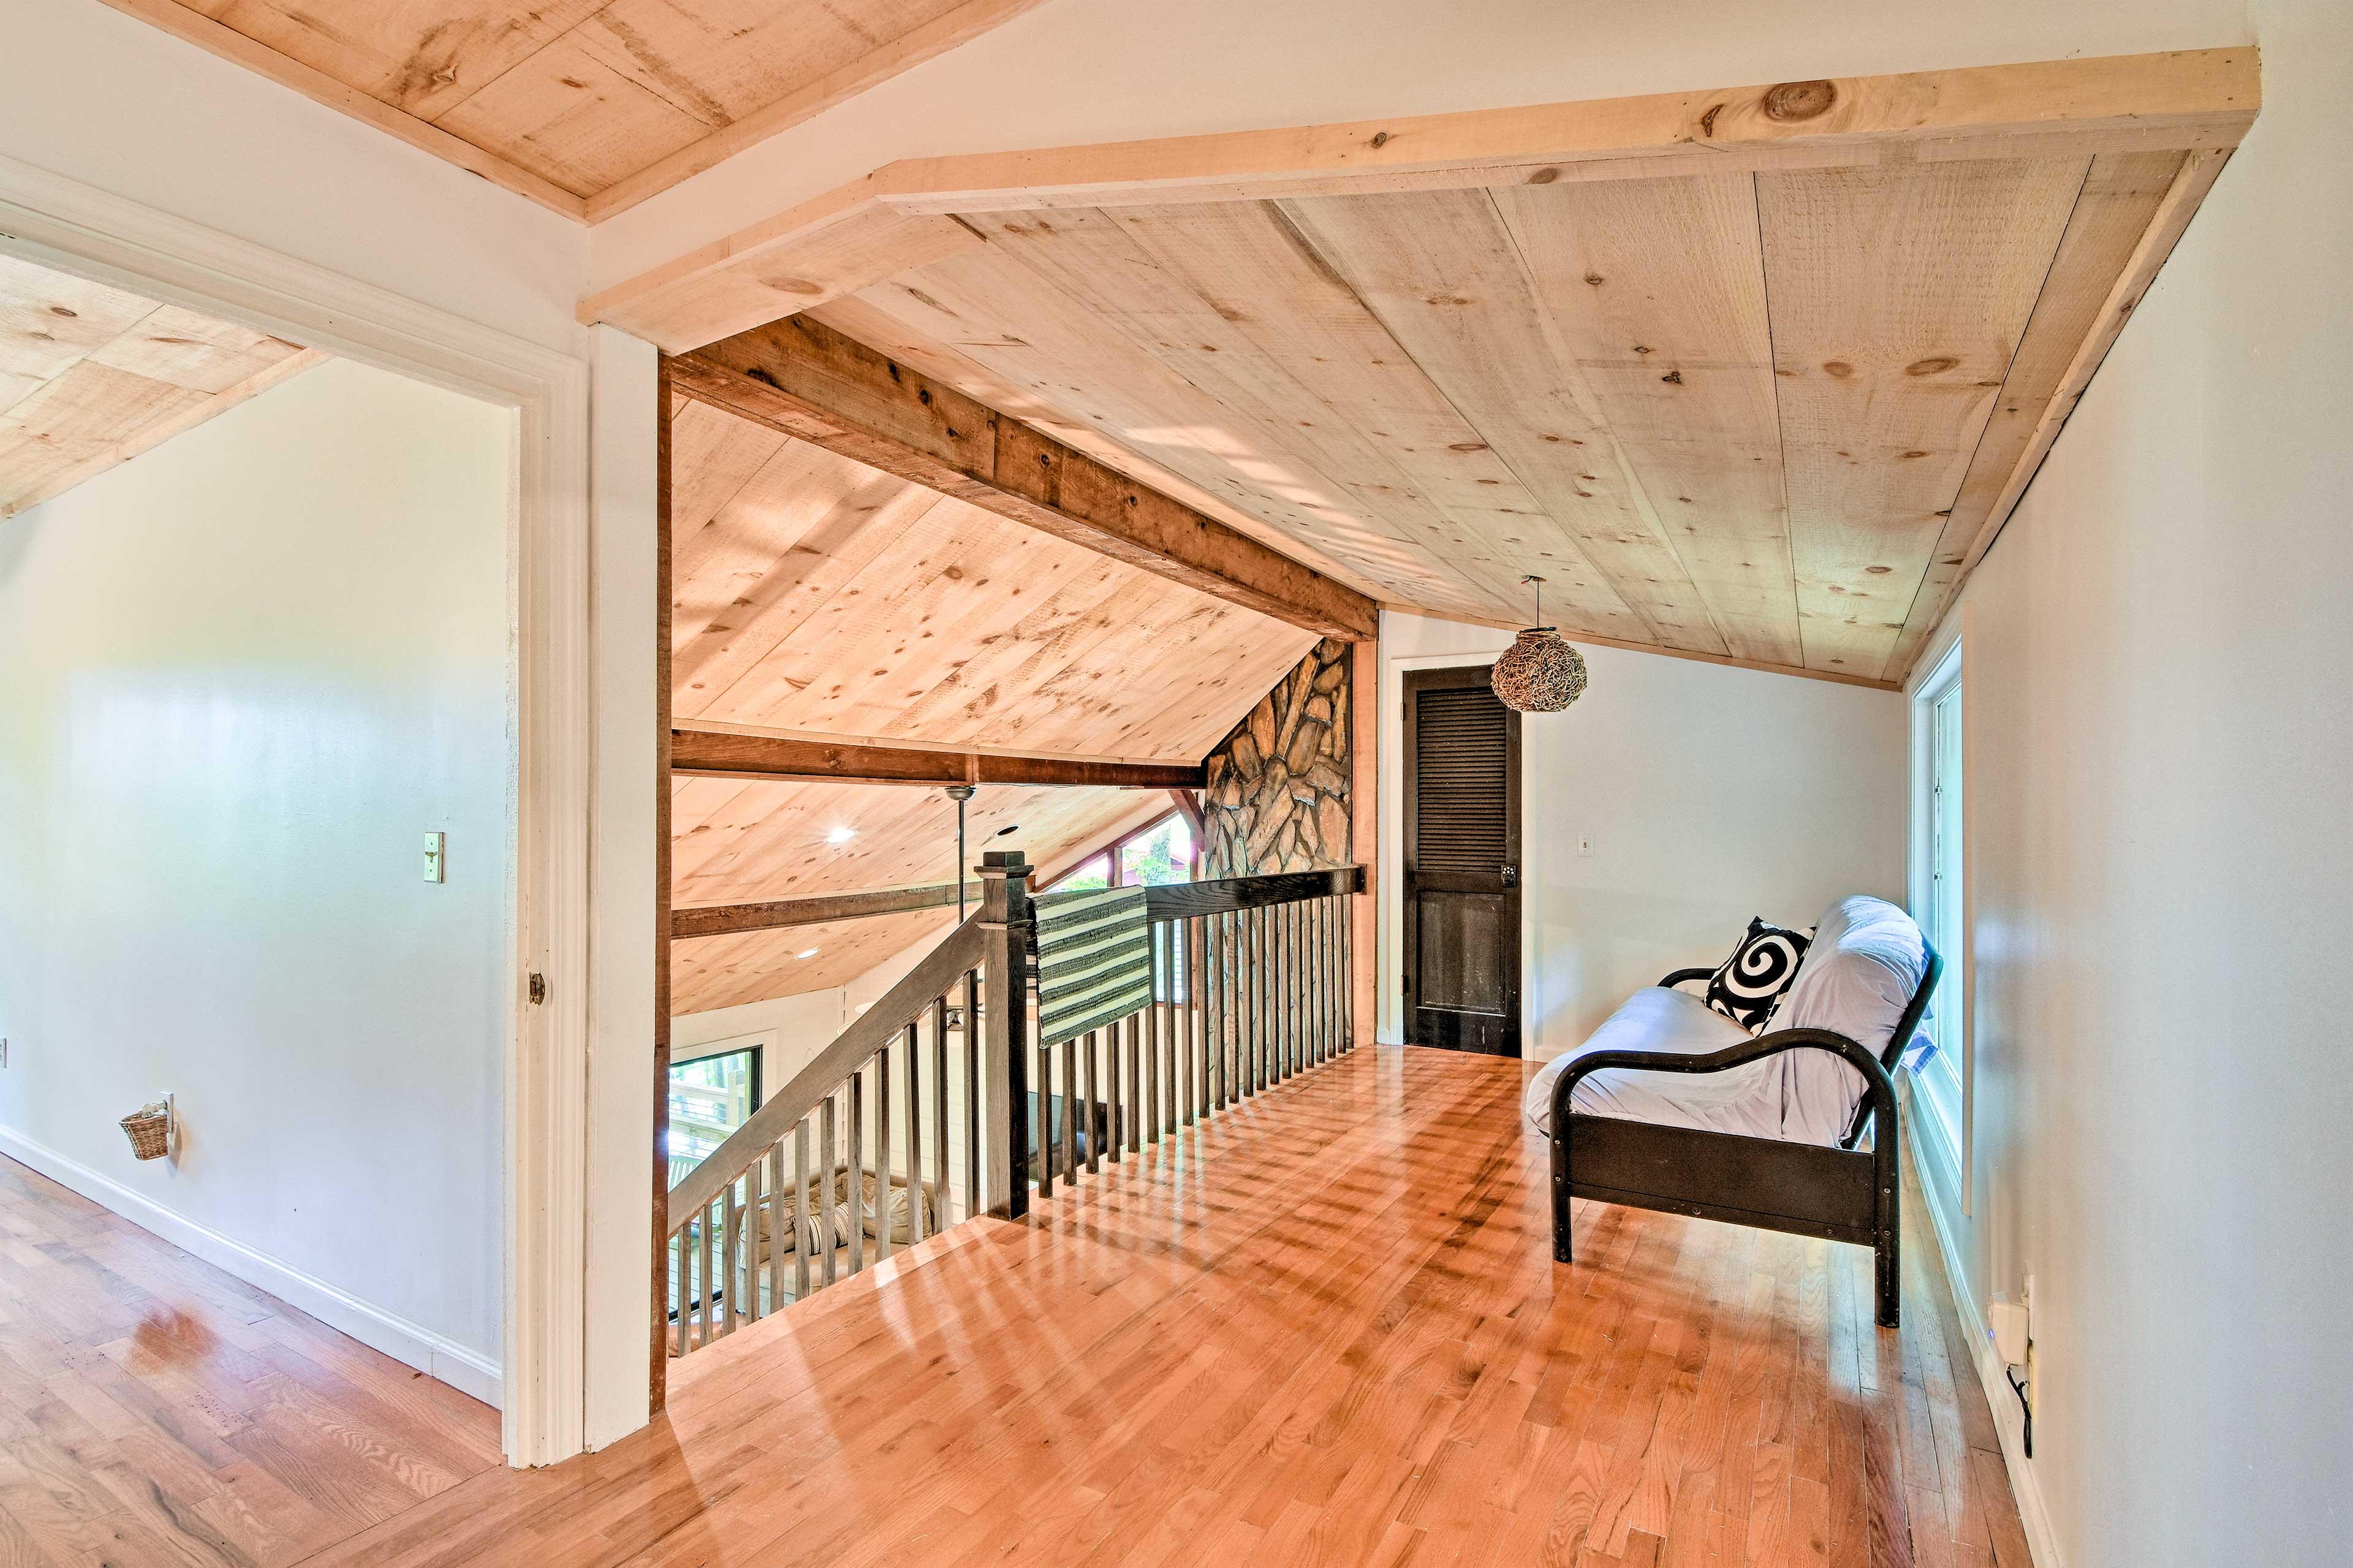 A futon can sleep 2 in the upstairs loft.